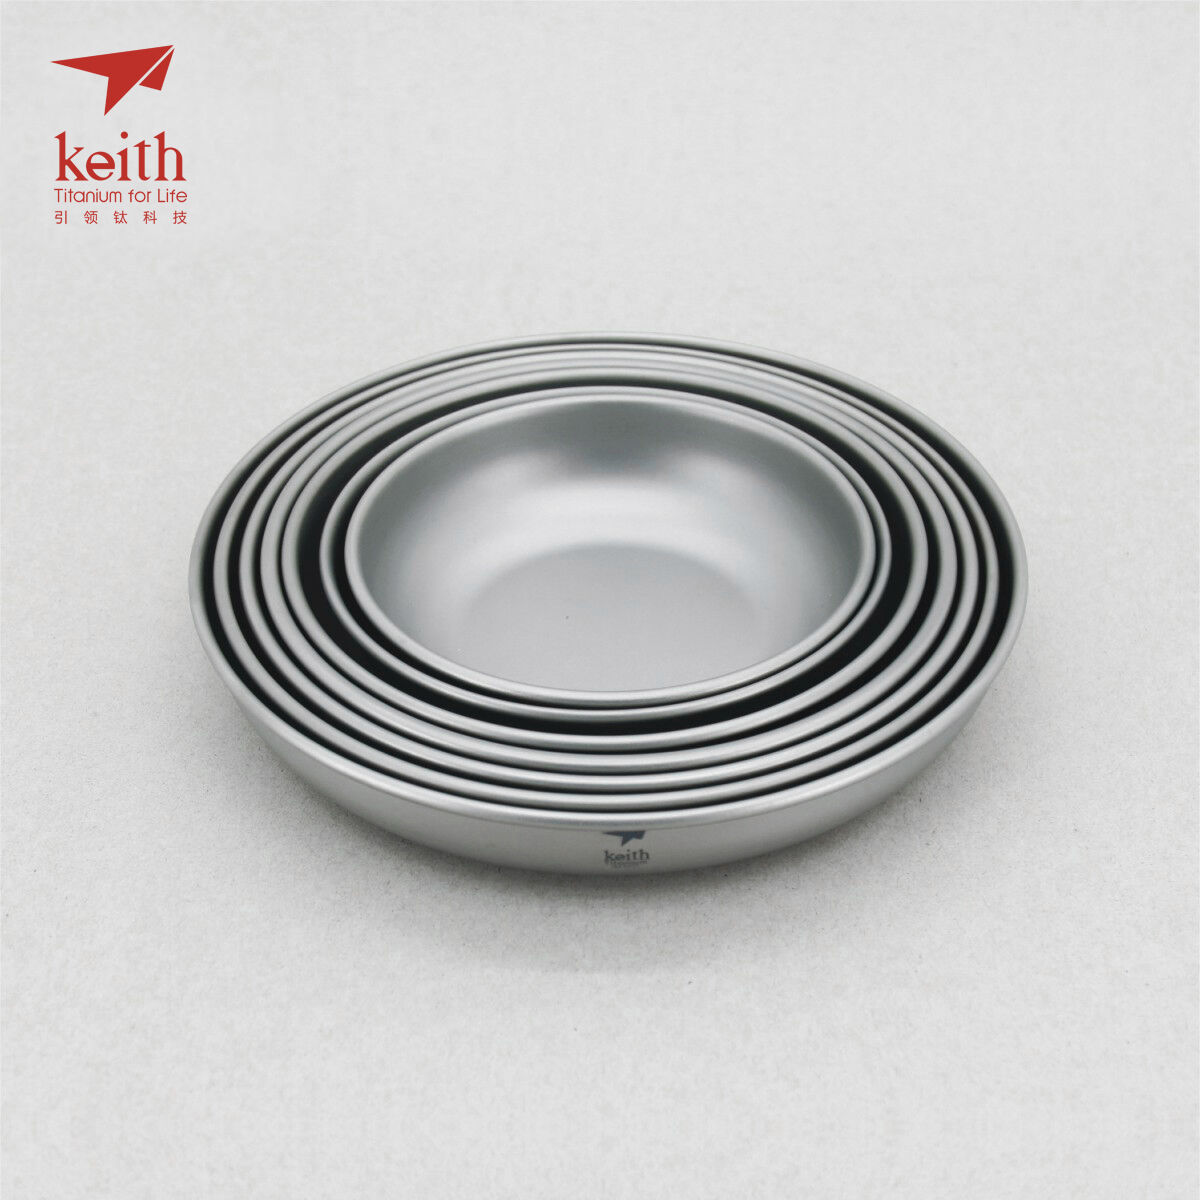 Keith Titanium from Ti5371 7-Piece Plate Set (Shipped from Titanium California, USA) 53493e